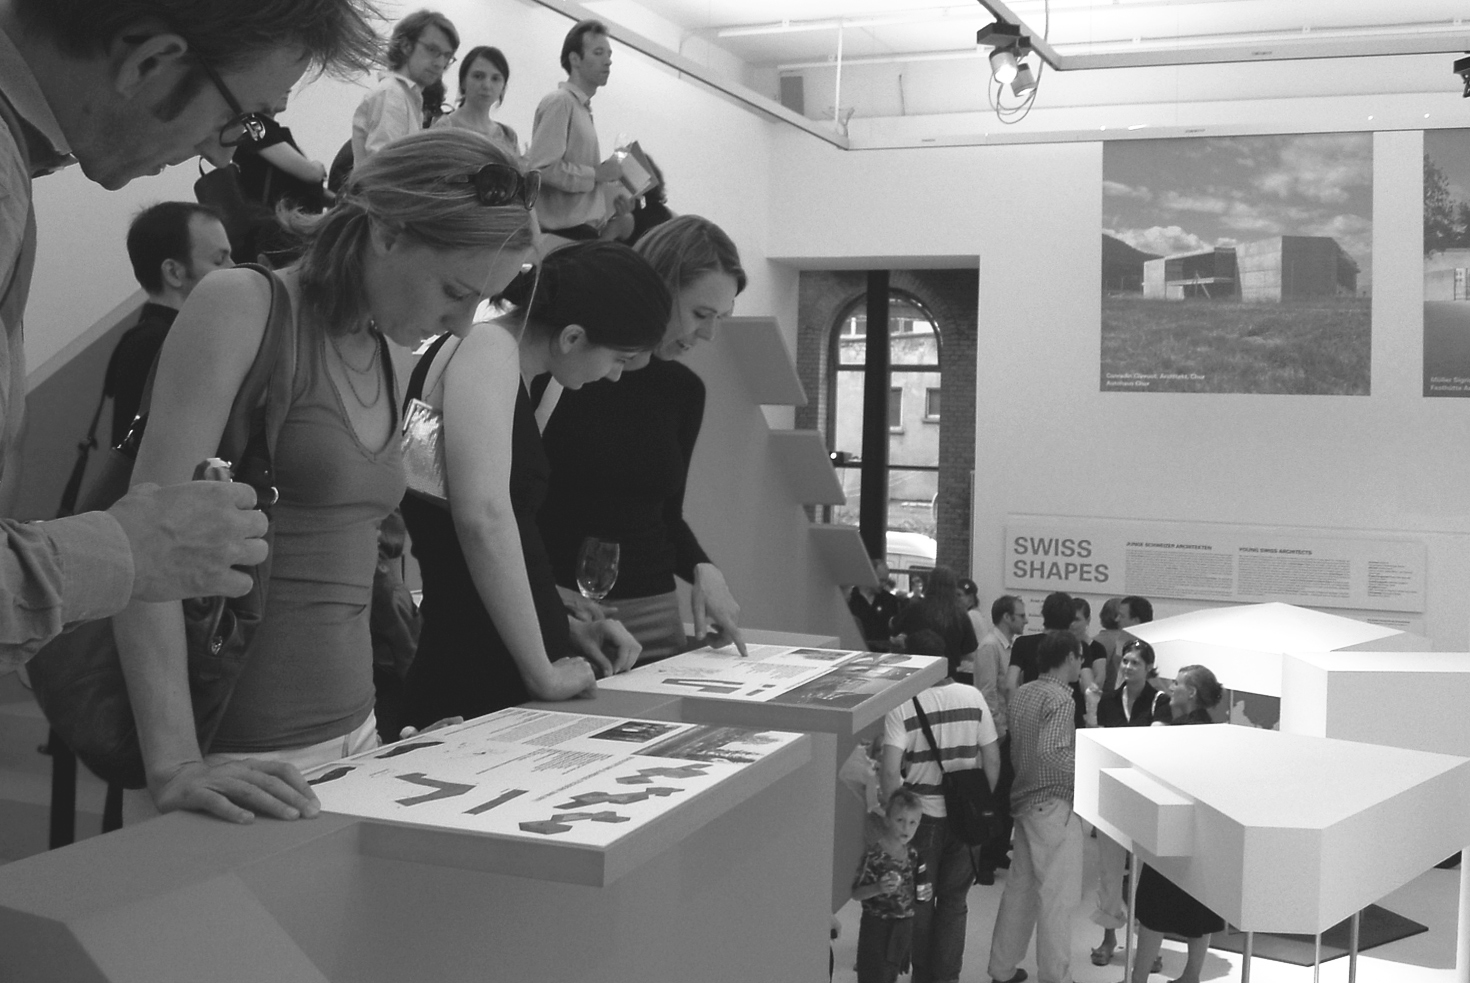 Ziemlich Kessel Arbeiten Galerie - Verdrahtungsideen - korsmi.info